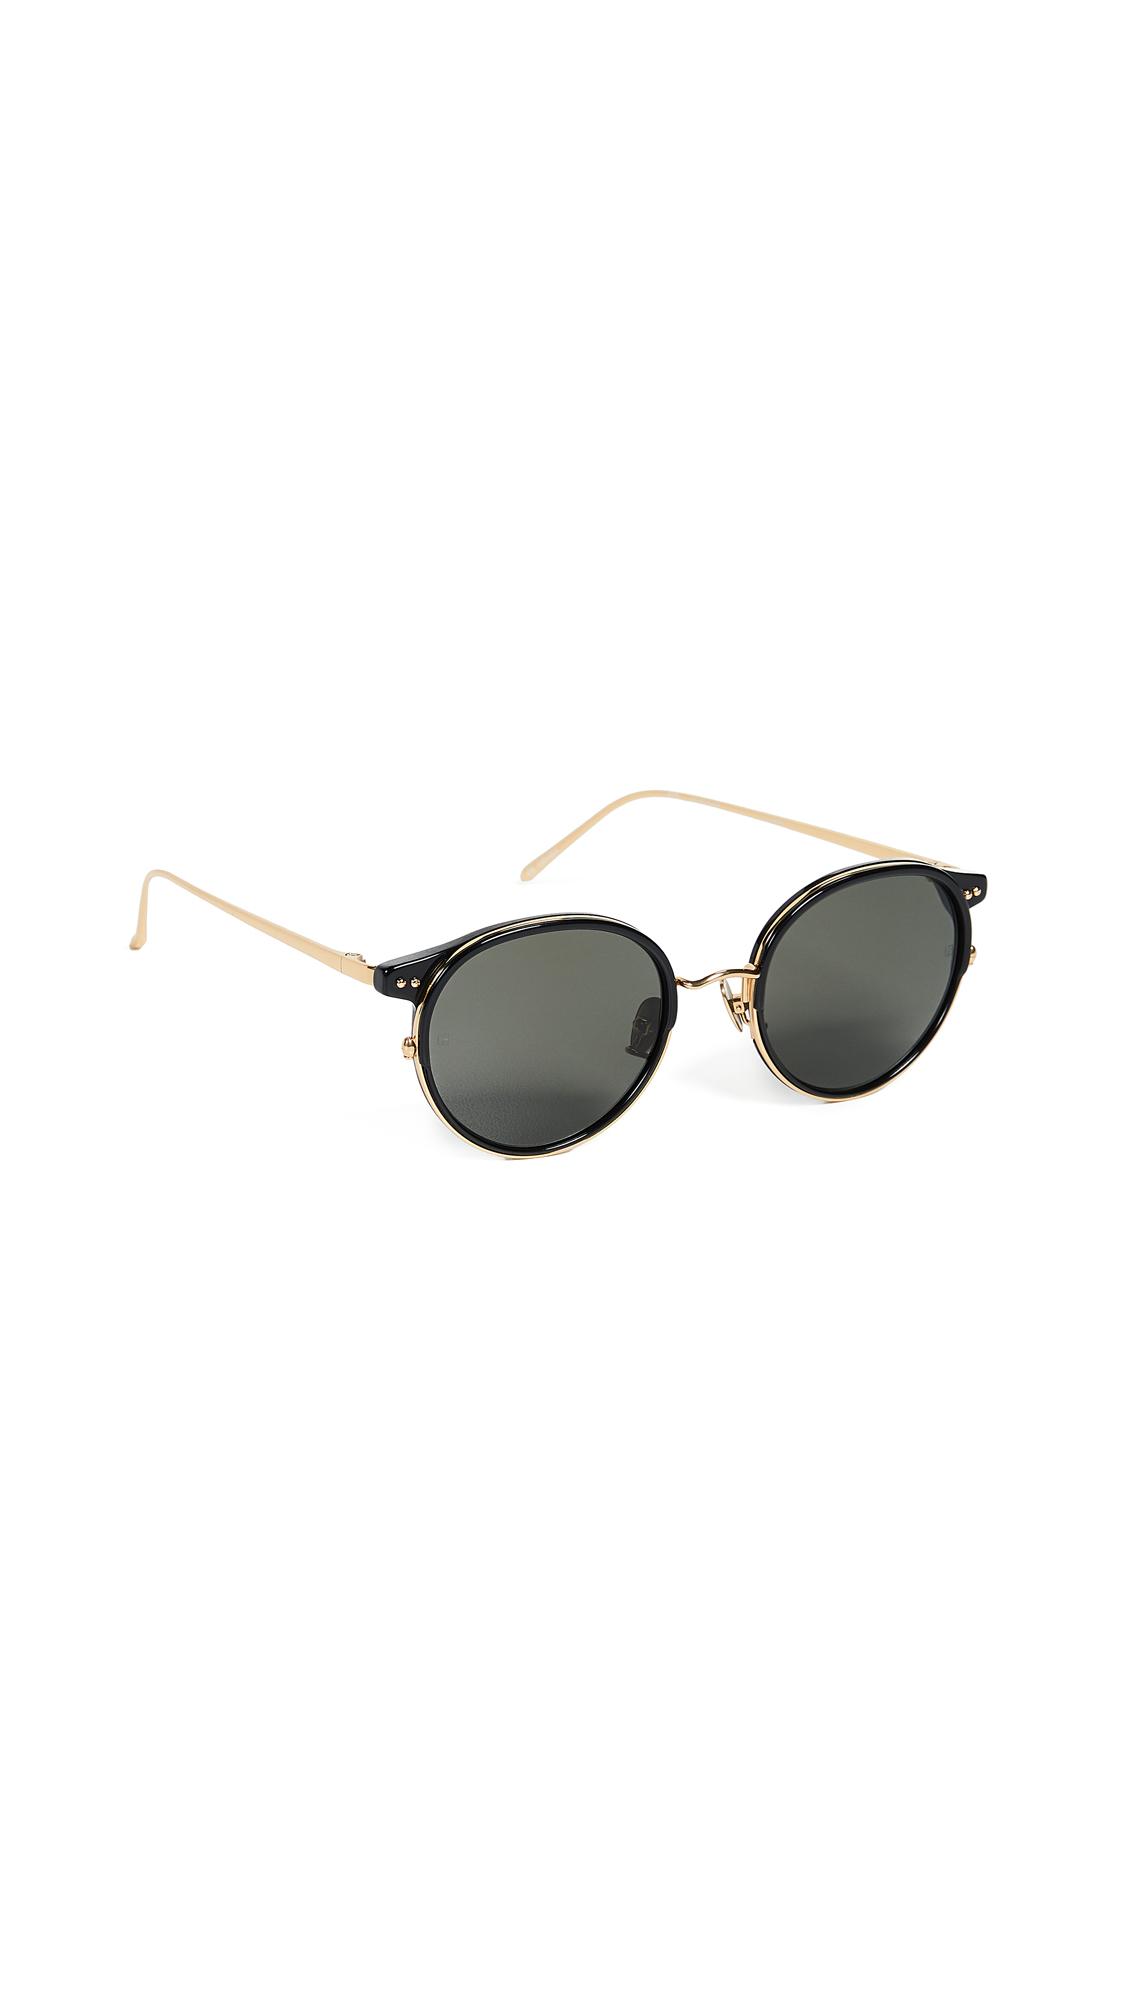 LINDA FARROW LUXE Round Sunglasses in Black Yellow Gold/Grey